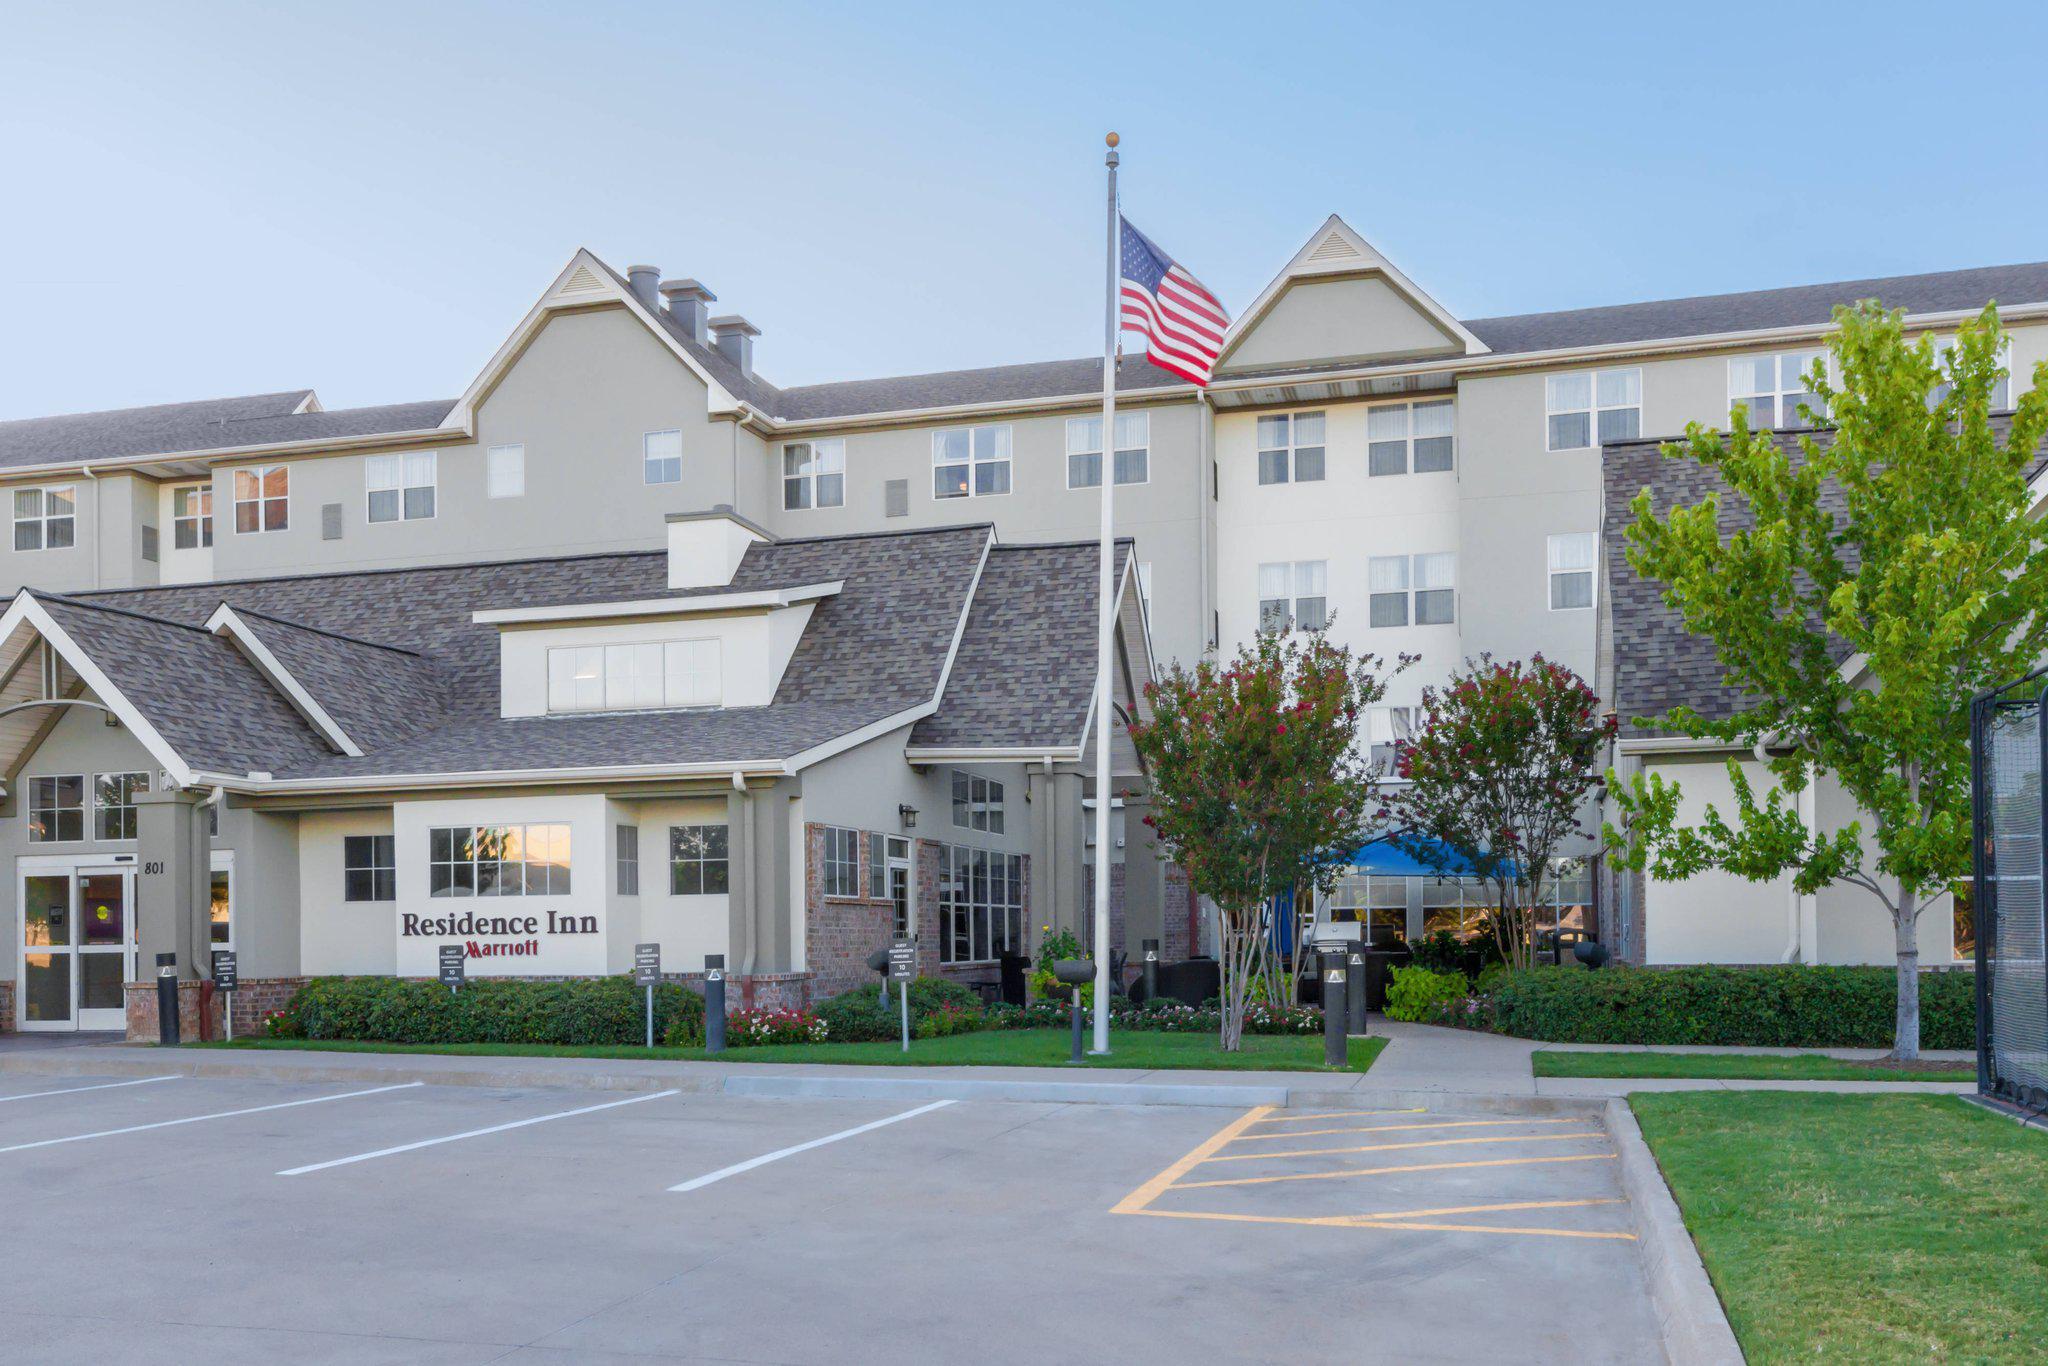 Residence Inn by Marriott Dallas Arlington South